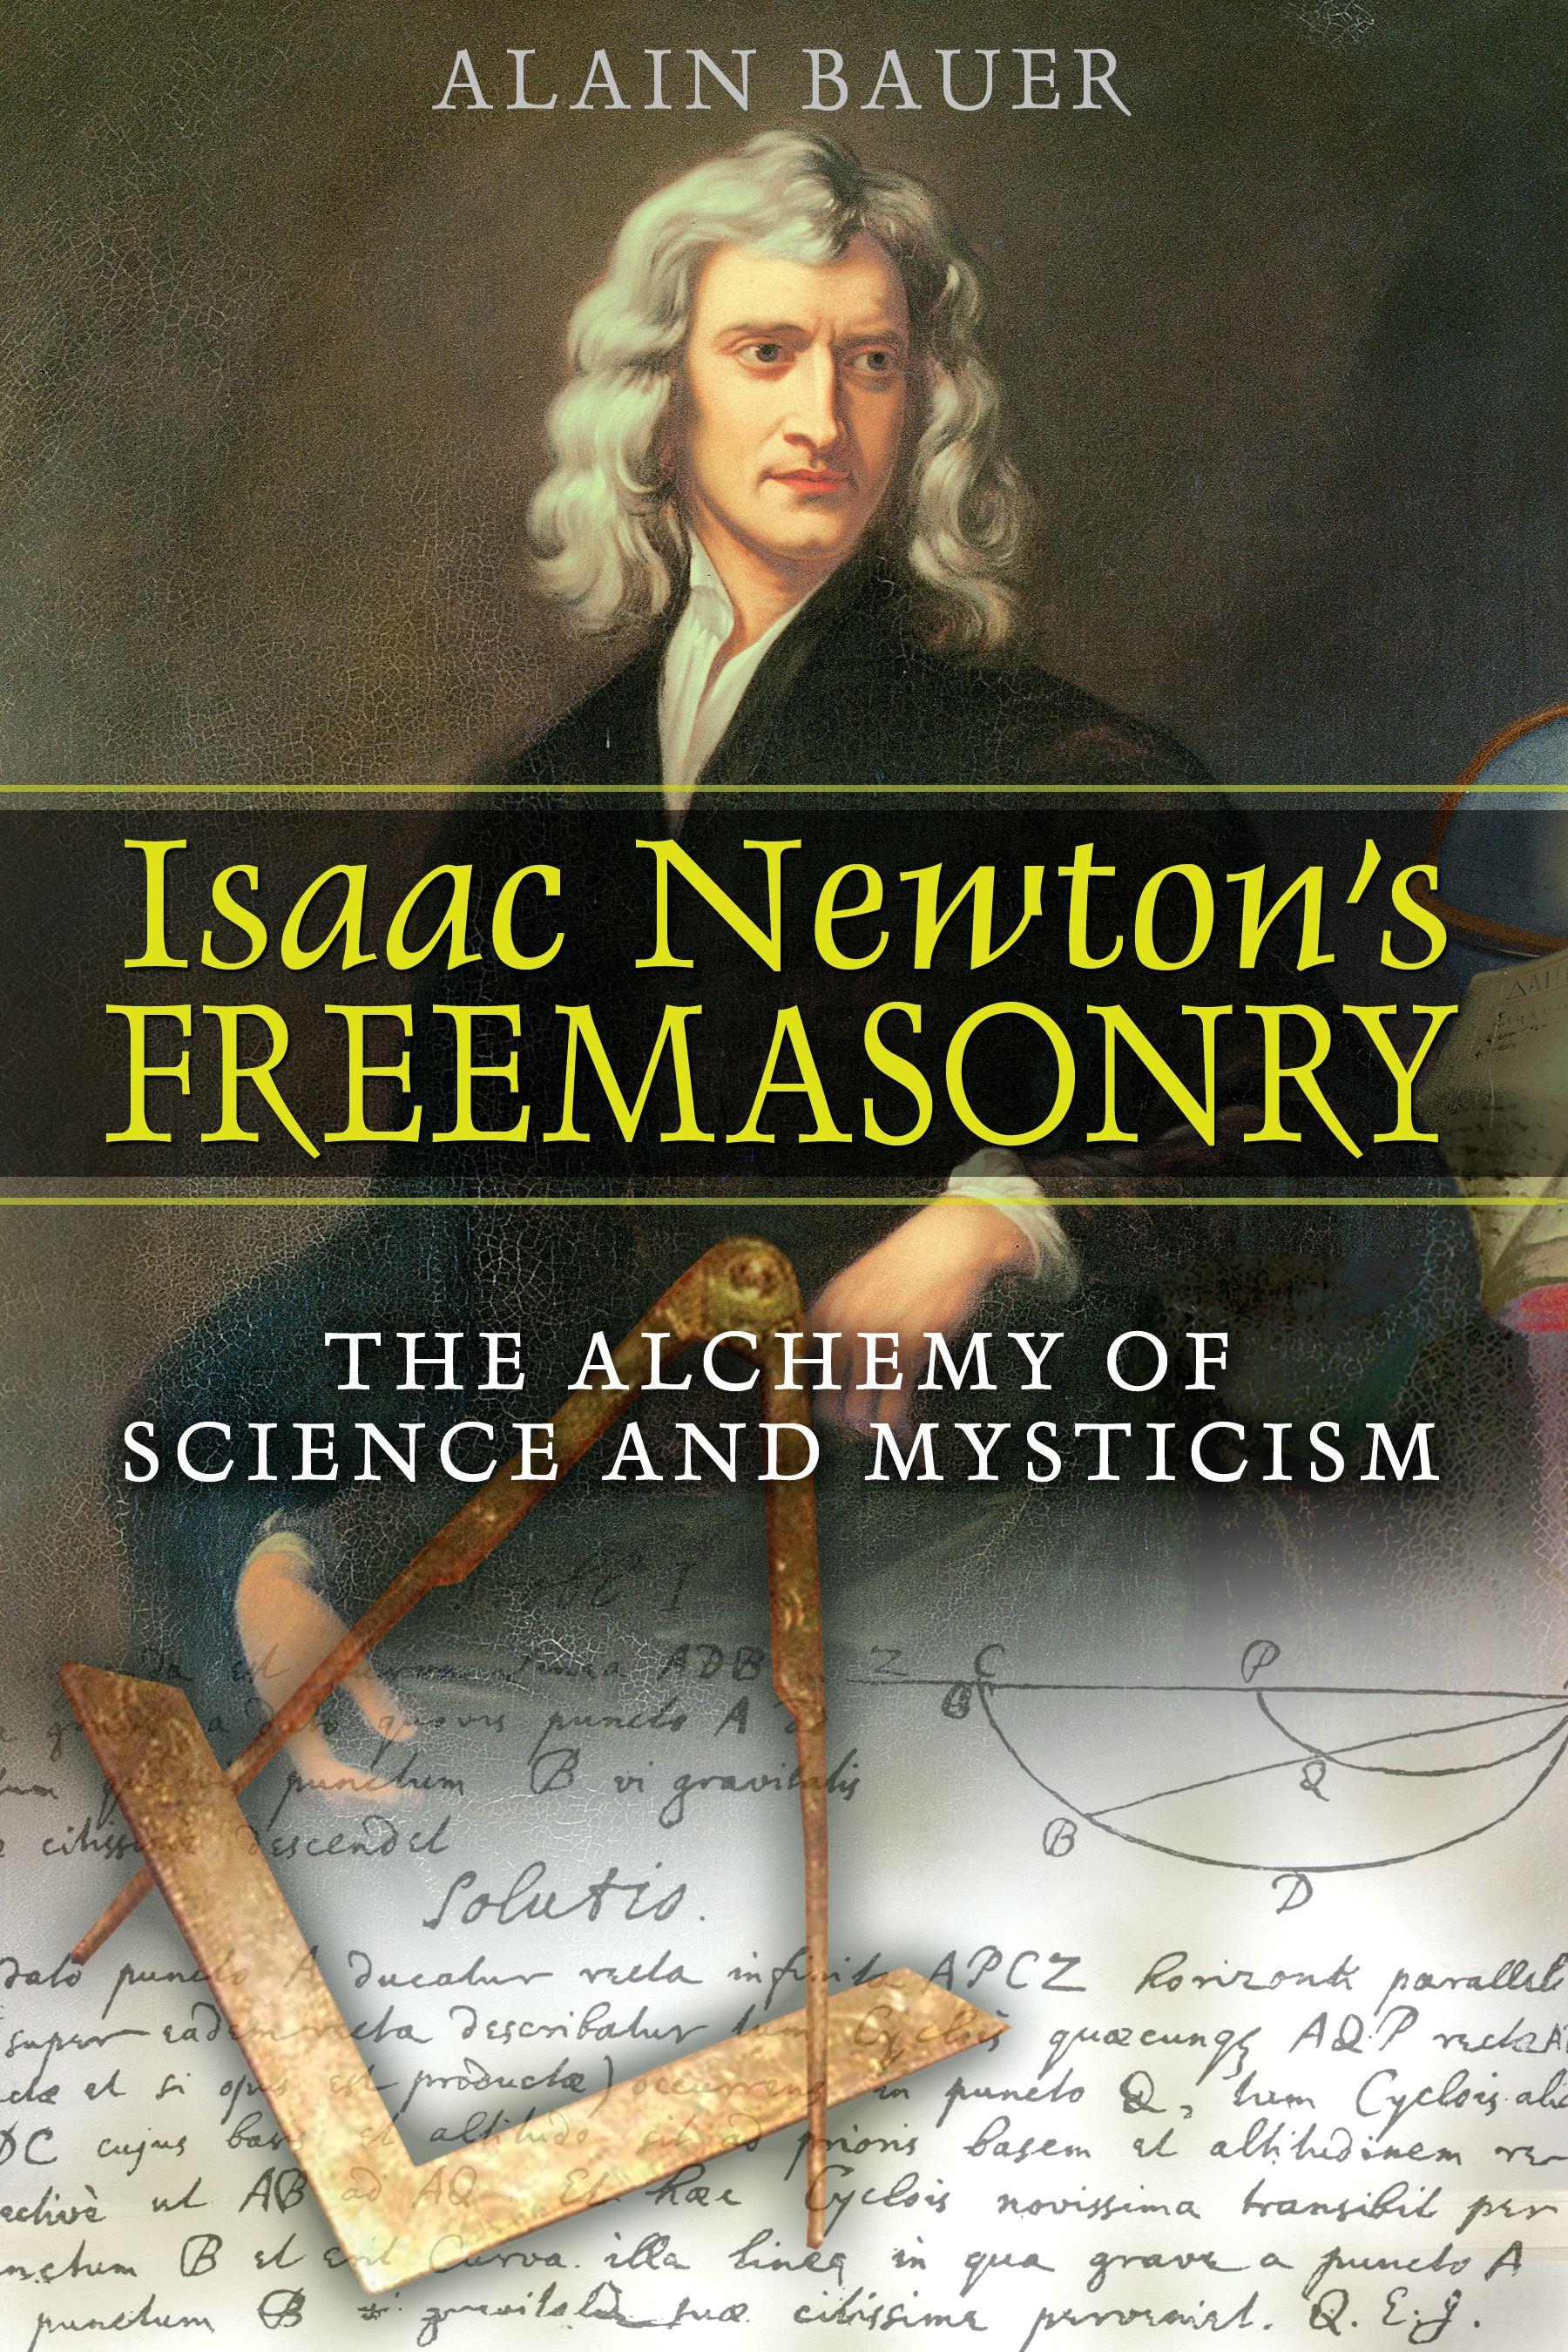 Isaac newtons freemasonry 9781594771729 hr